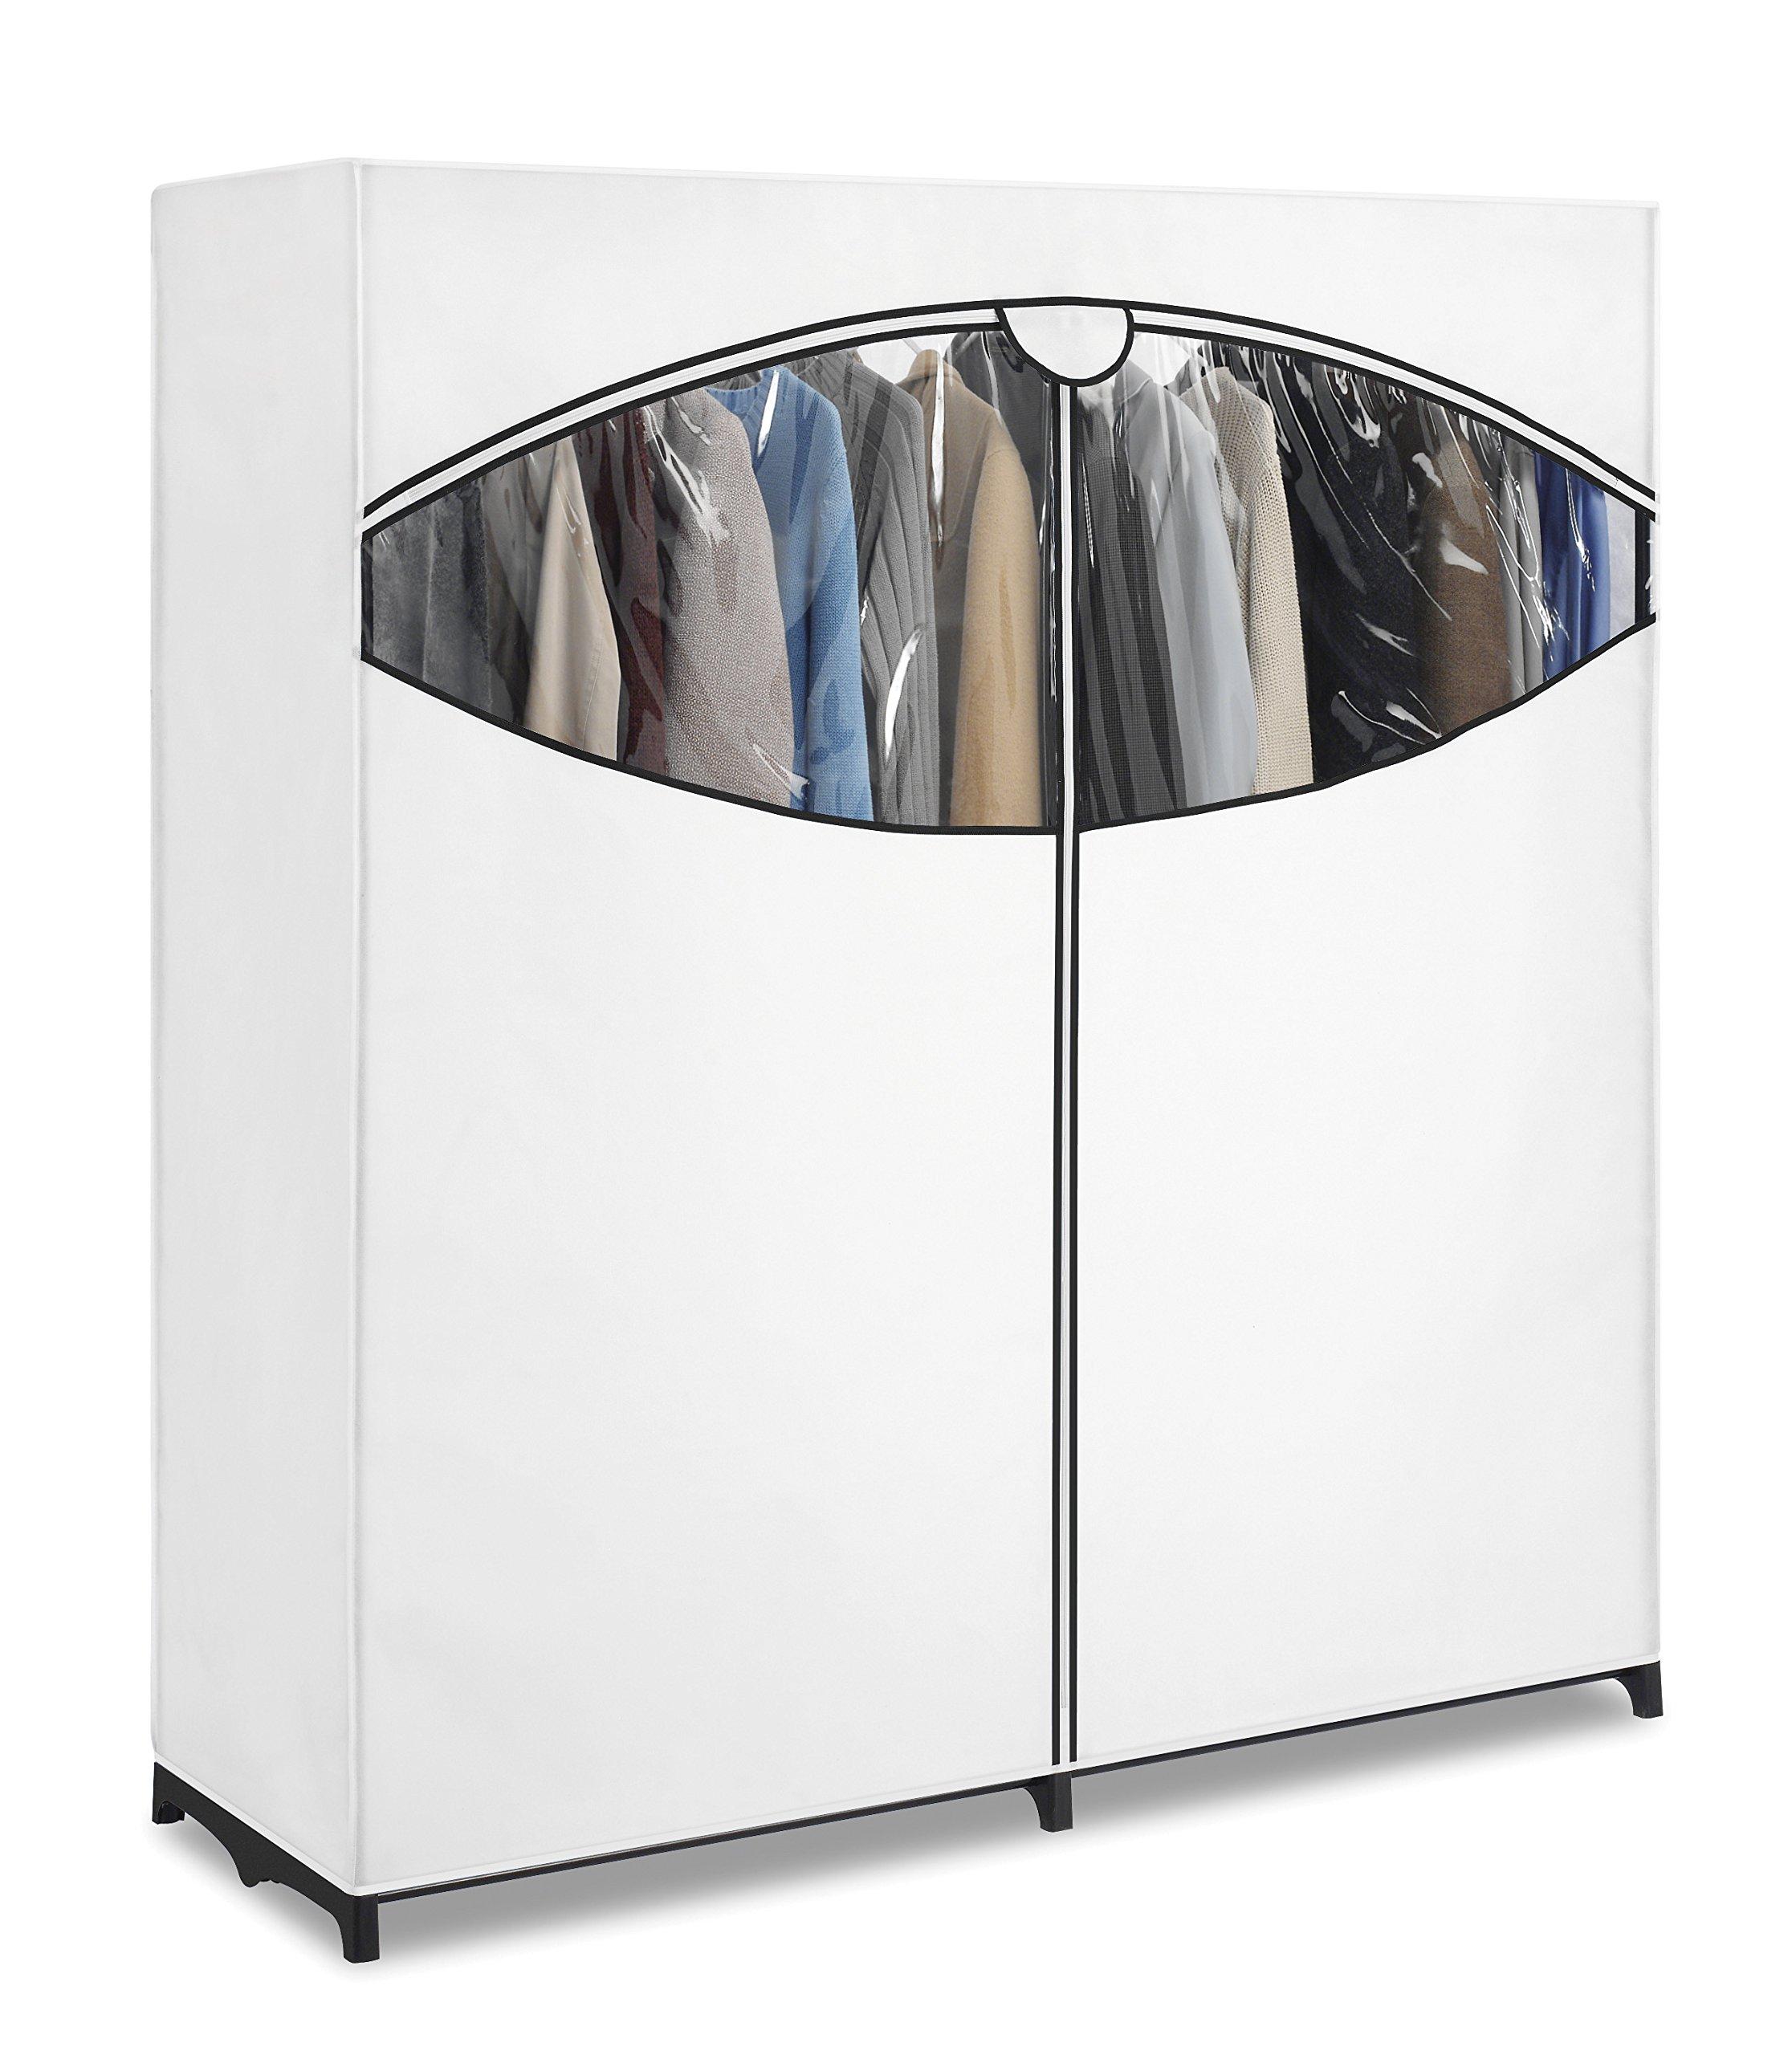 Clothes Closet Extra Wide Portable Wardrobe Breathable